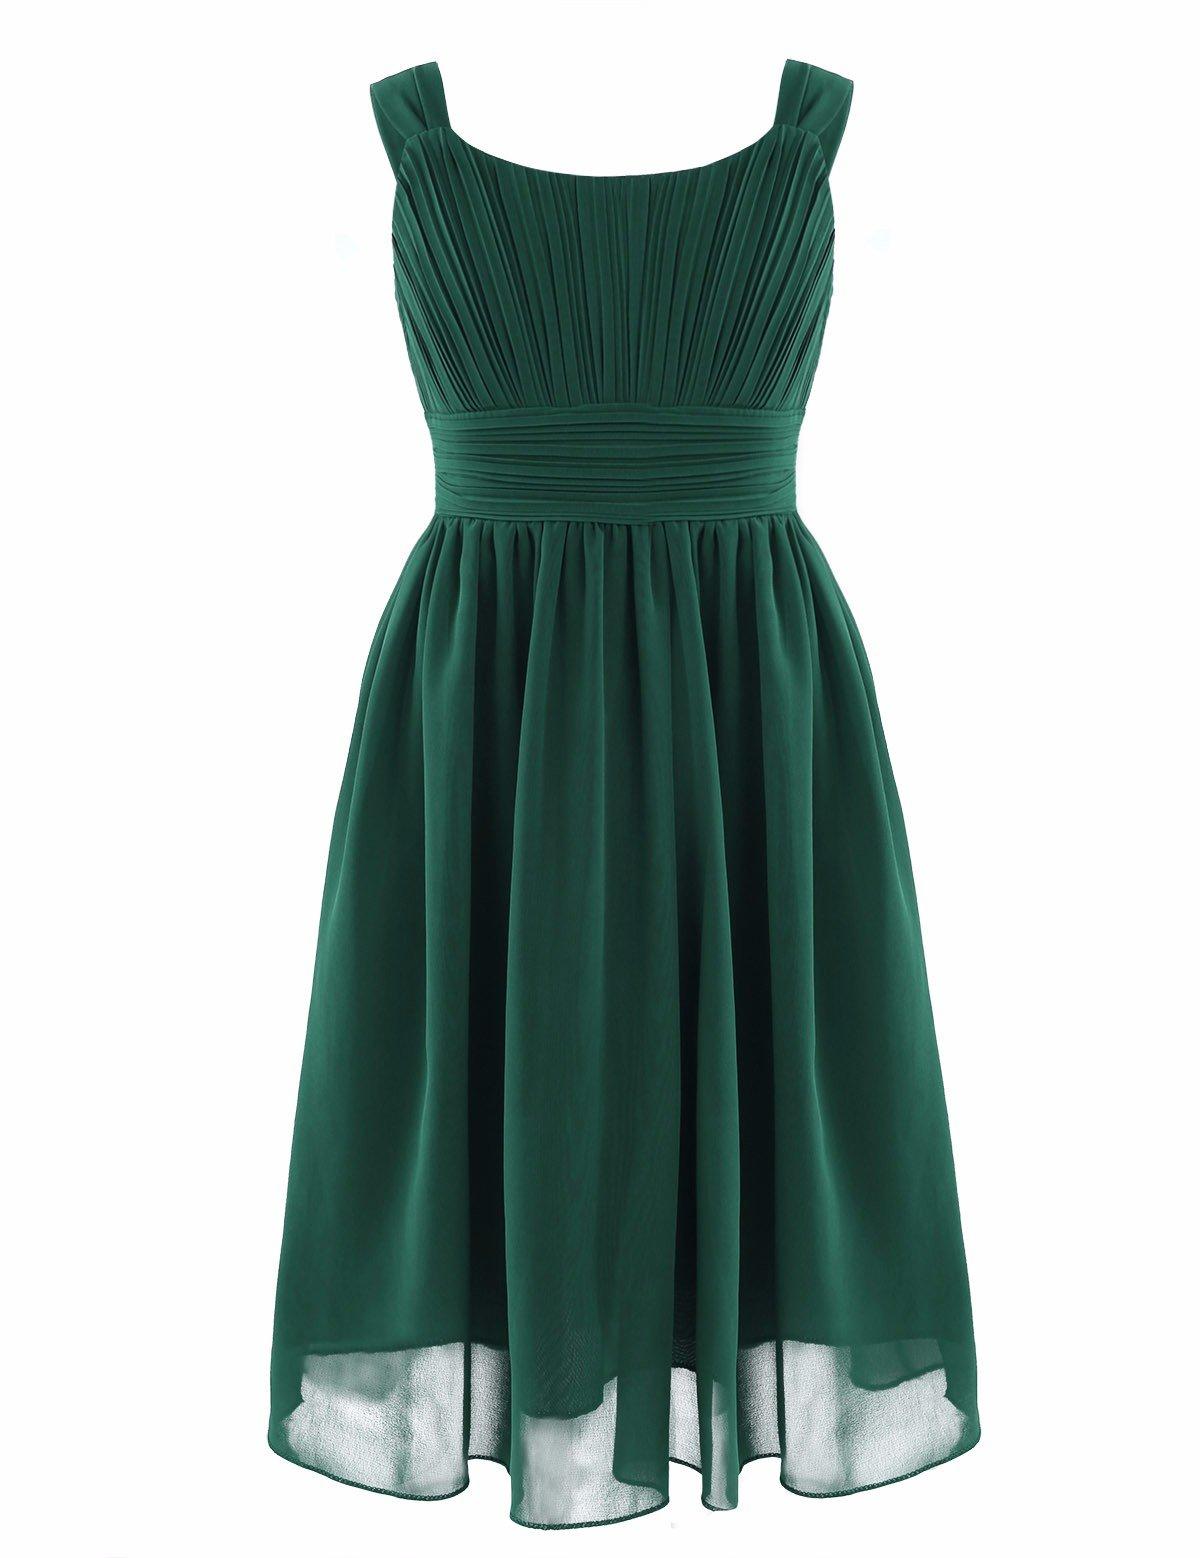 2d4ccd635 YiZYiF Kids Big Girl Sleeveless Pleated Chiffon Flower Wedding Bridesmaid  Formal Party Dress Green 10